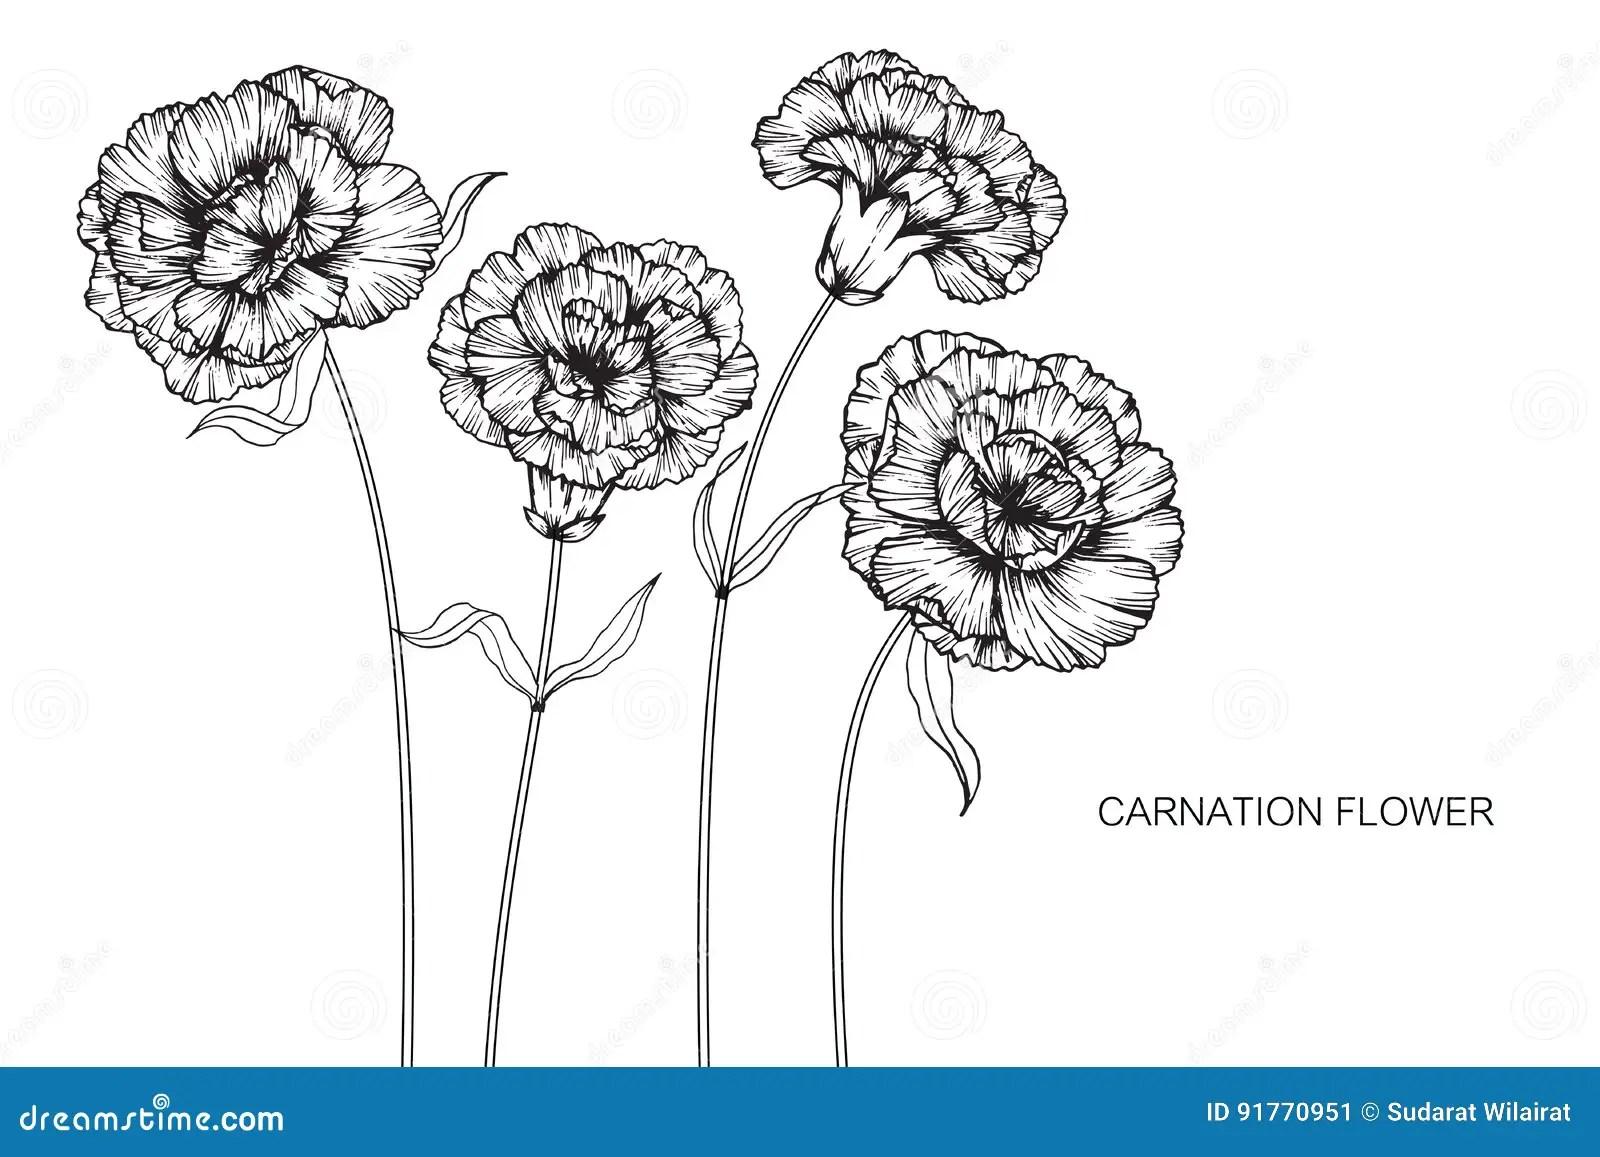 hight resolution of carnation flower diagram wiring diagram expert carnation flower anatomy carnation flower diagram